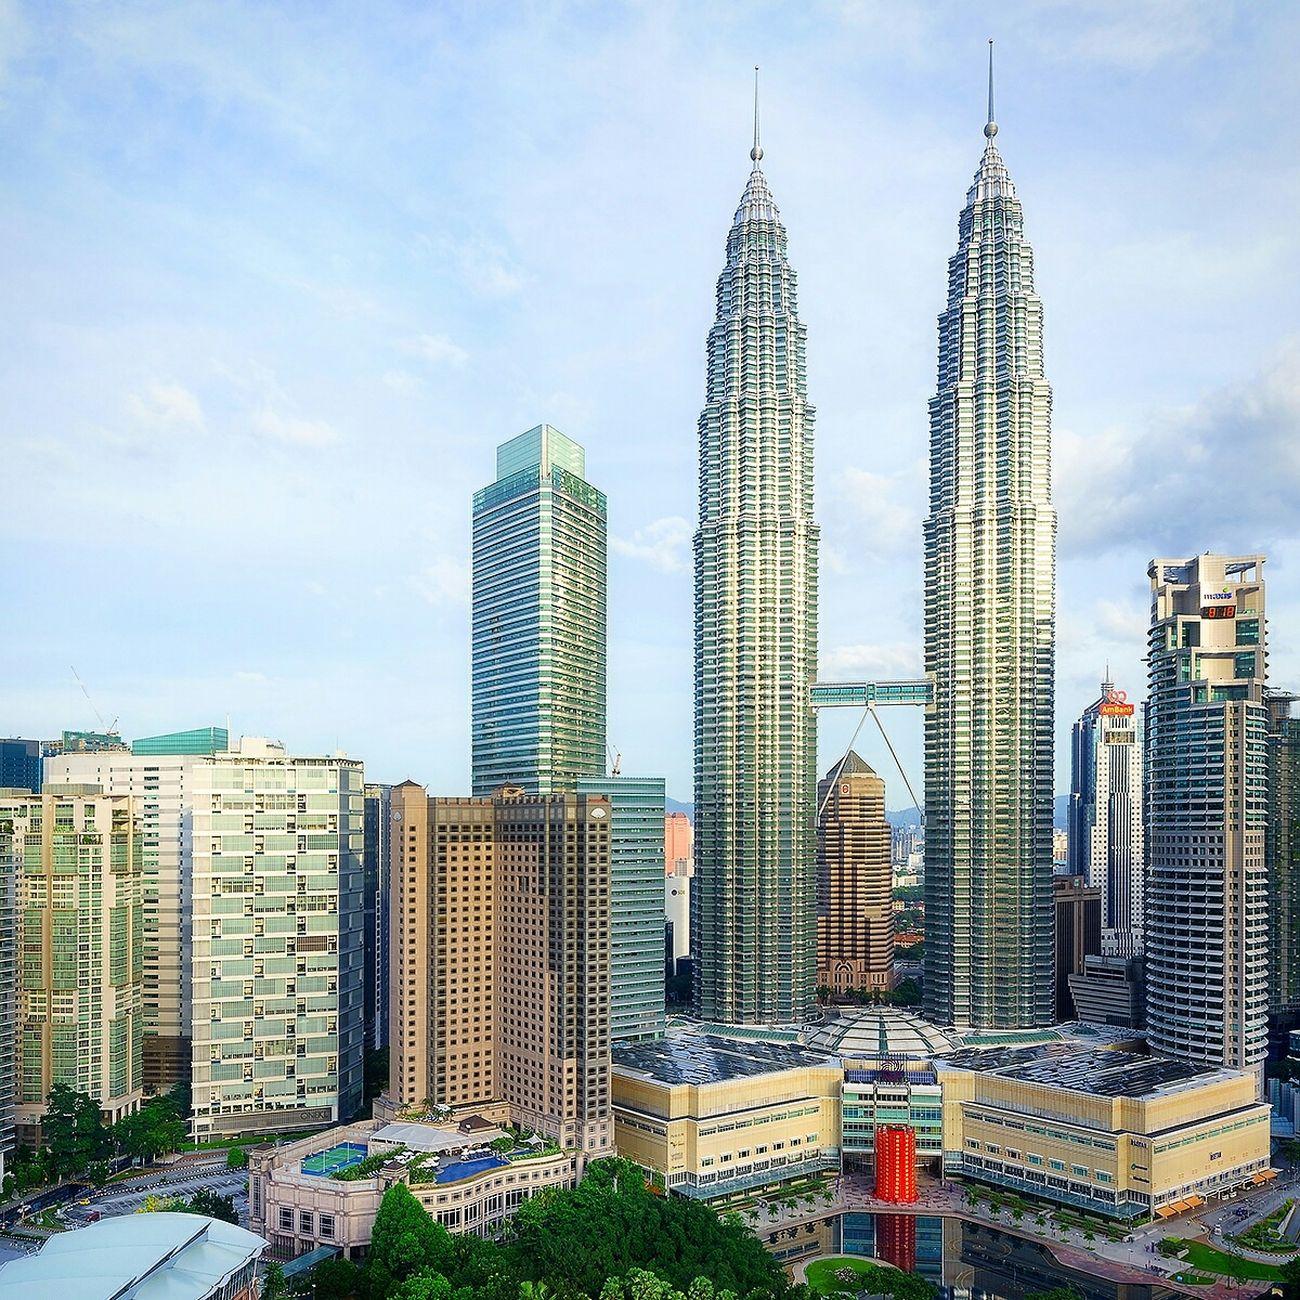 Kuala Lumpur Malaysia ASIA Petronas Twin Towers Petronas Aerial Shot Morning Blue Sky EyeEm Best Shots EyeEm Best Edits EyeEmBestPics Travel Travel Photography